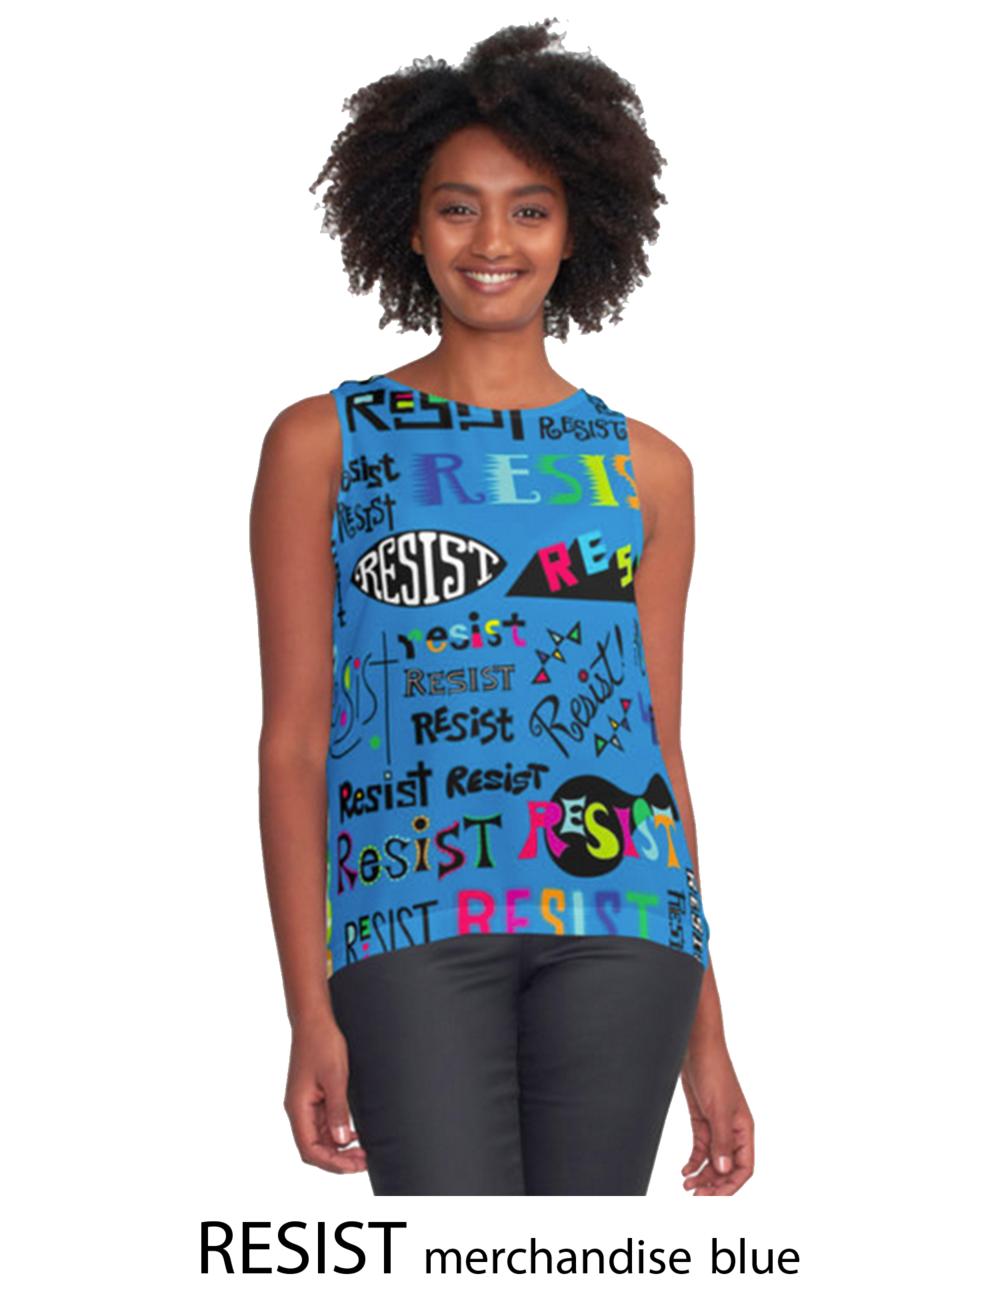 Resist blue merchandise